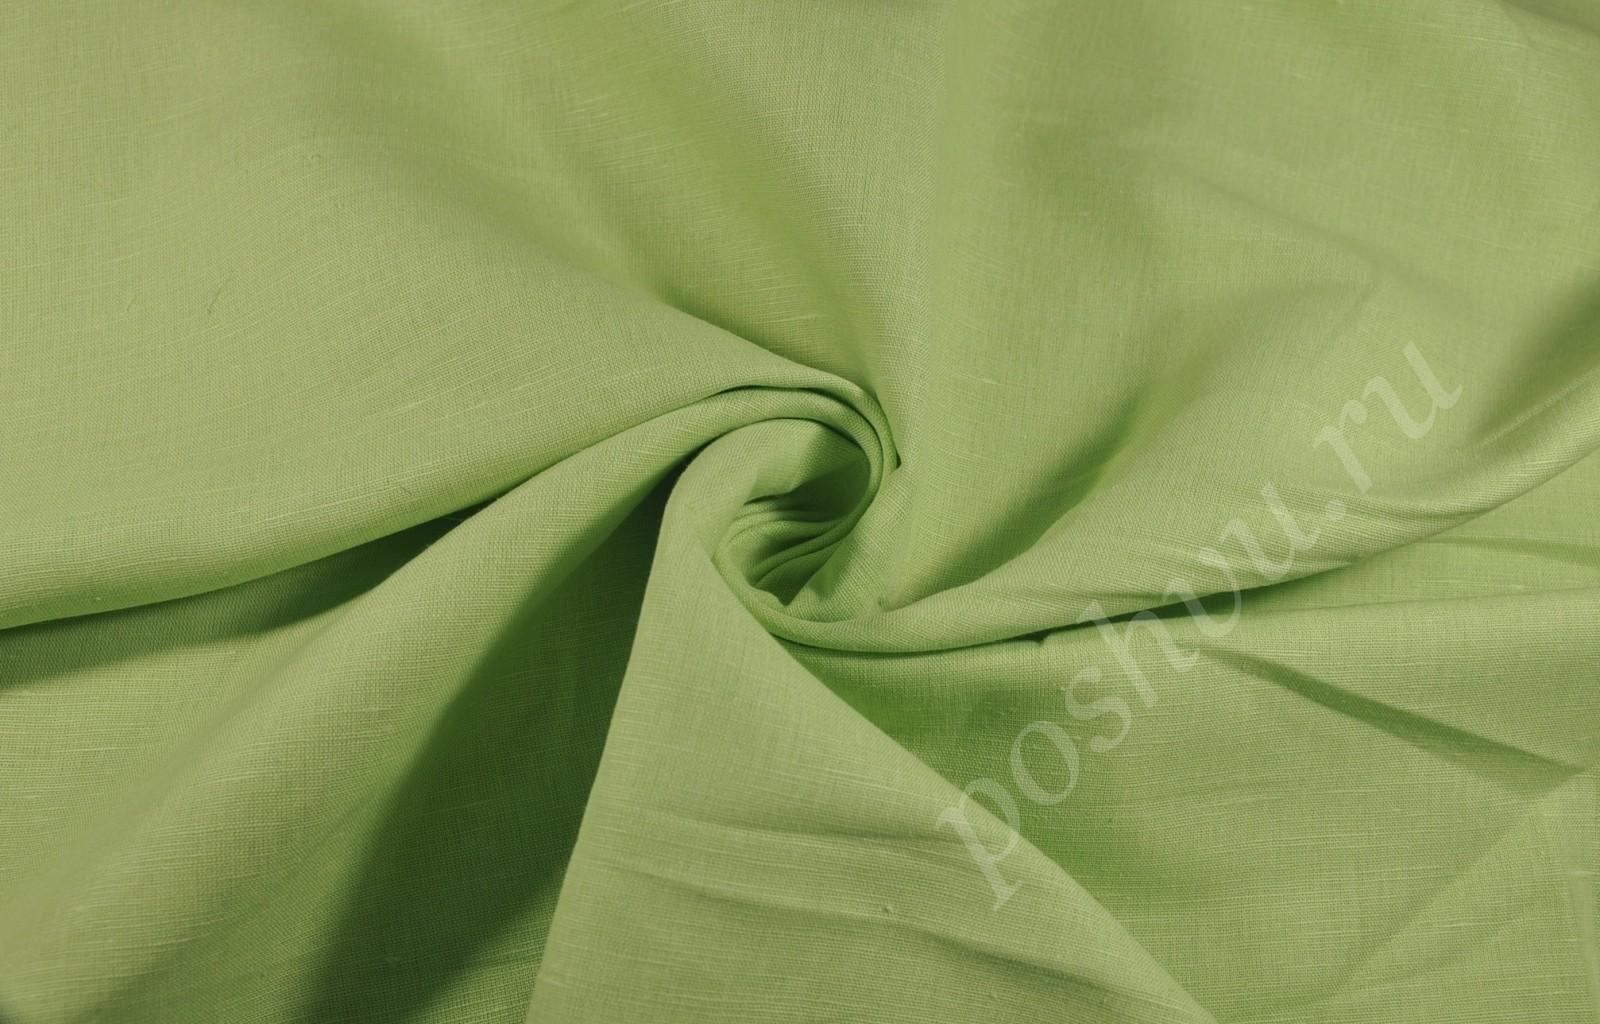 У кого самолёт зелёного цвета